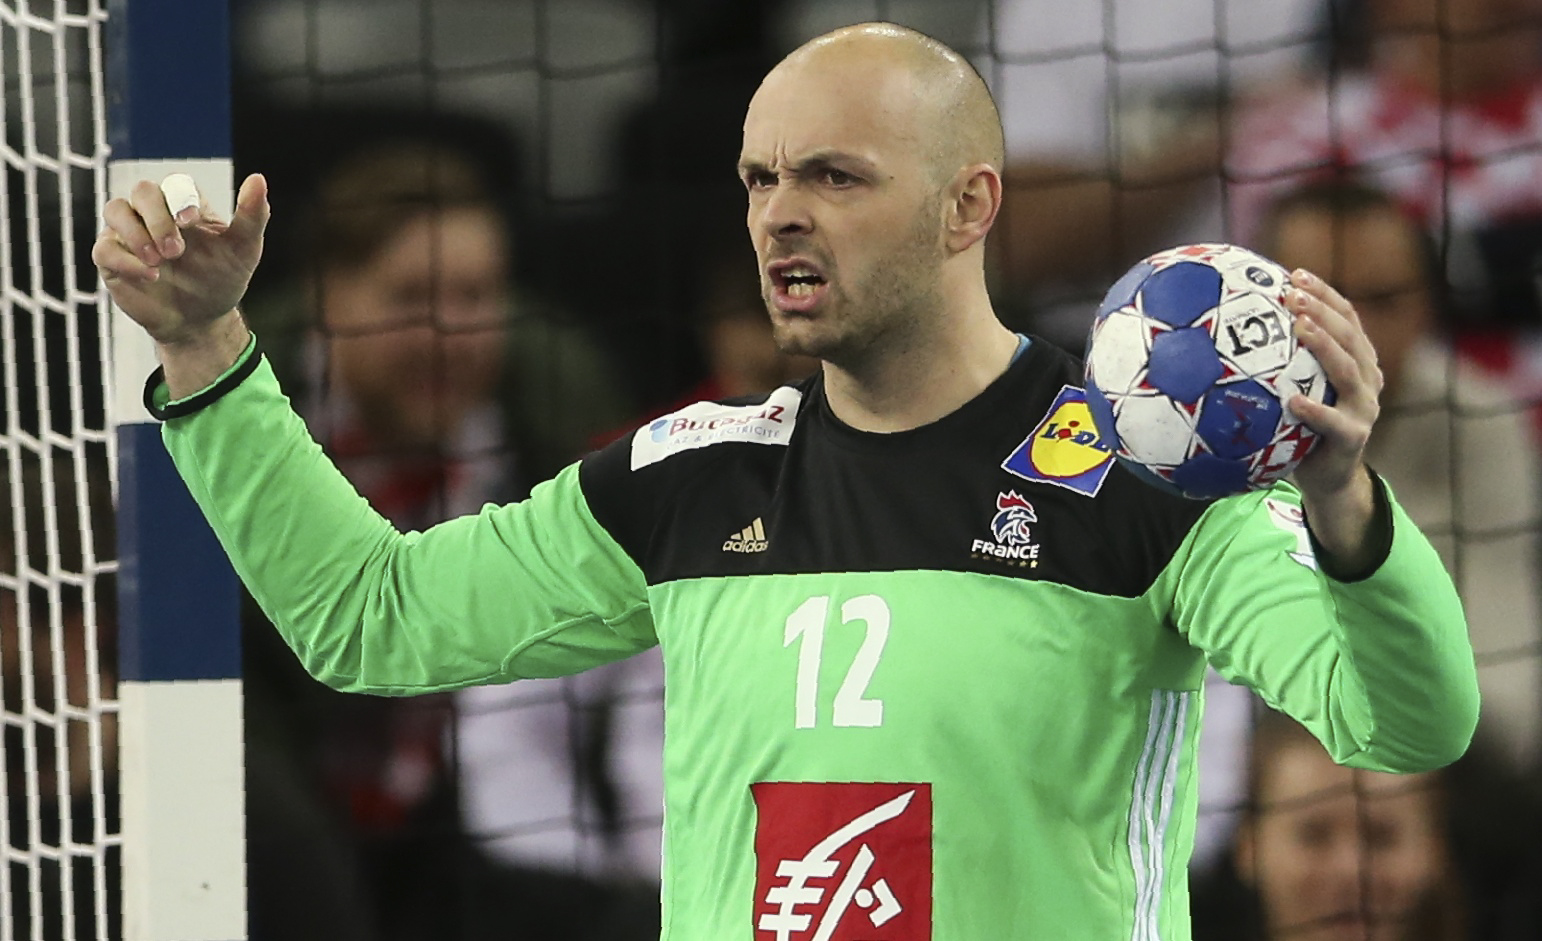 Handball - Equipe de France - Euro 2018 : La muraille française stoppe la Suède